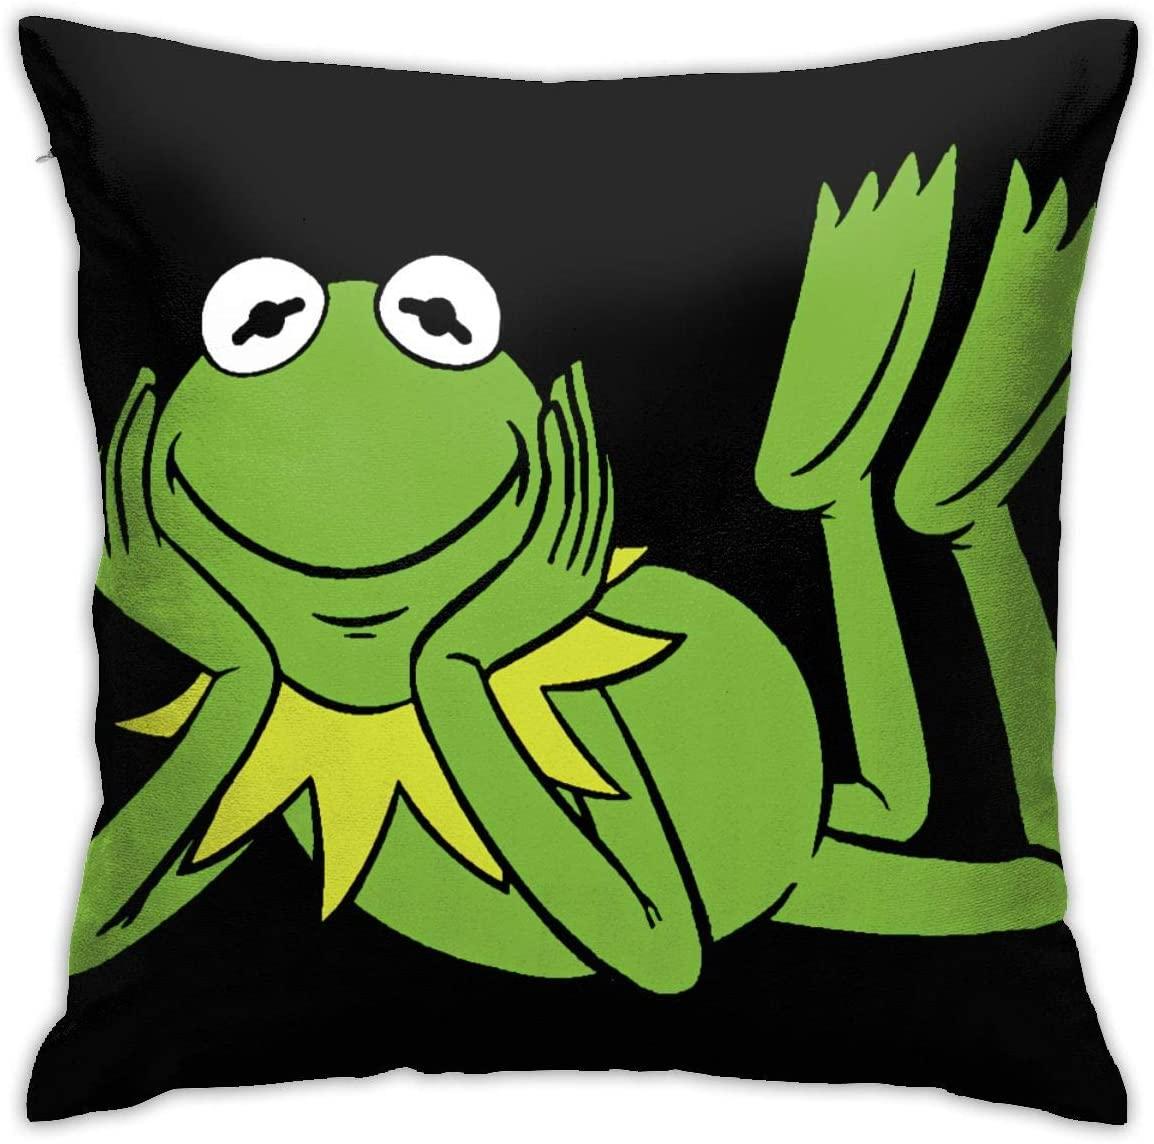 SkyeDana Kermit The Frog Pattern Hug Pillowcase Bedding Cover Pillowcase Sofa Home Decoration 18